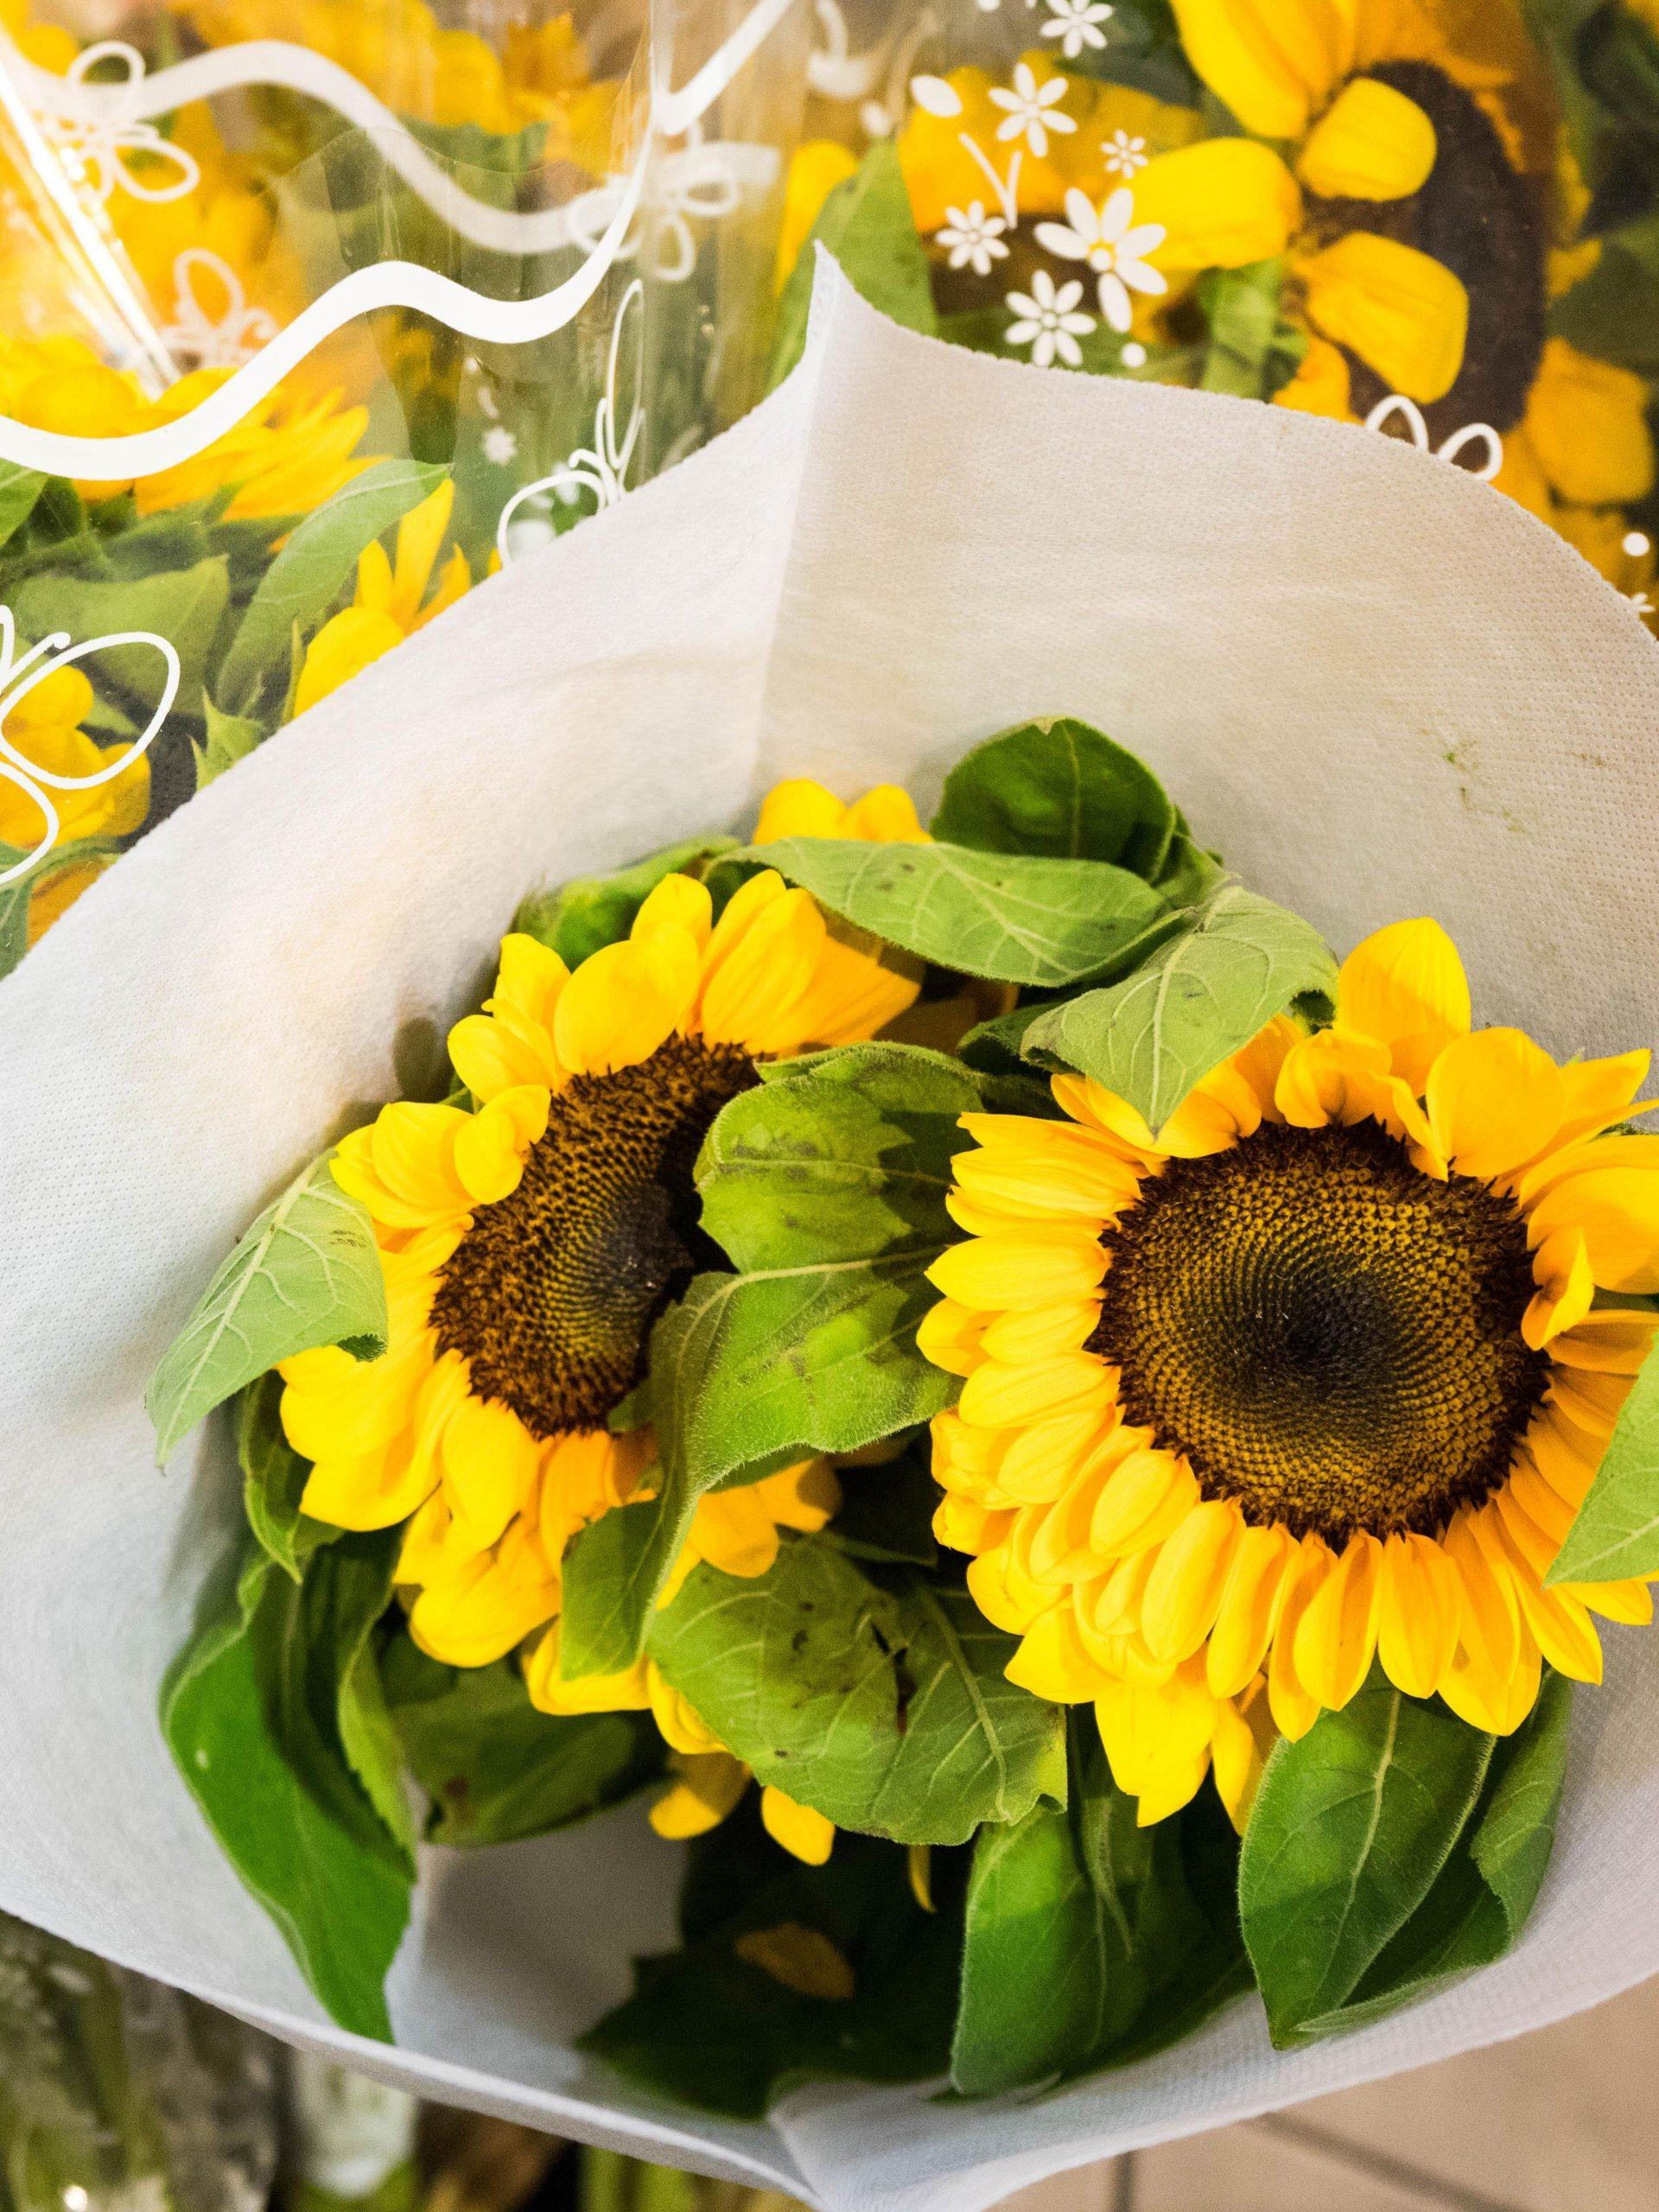 5 Stem Cut Sunflower Bouquets Pick Up Special Only Van Belle Flowers